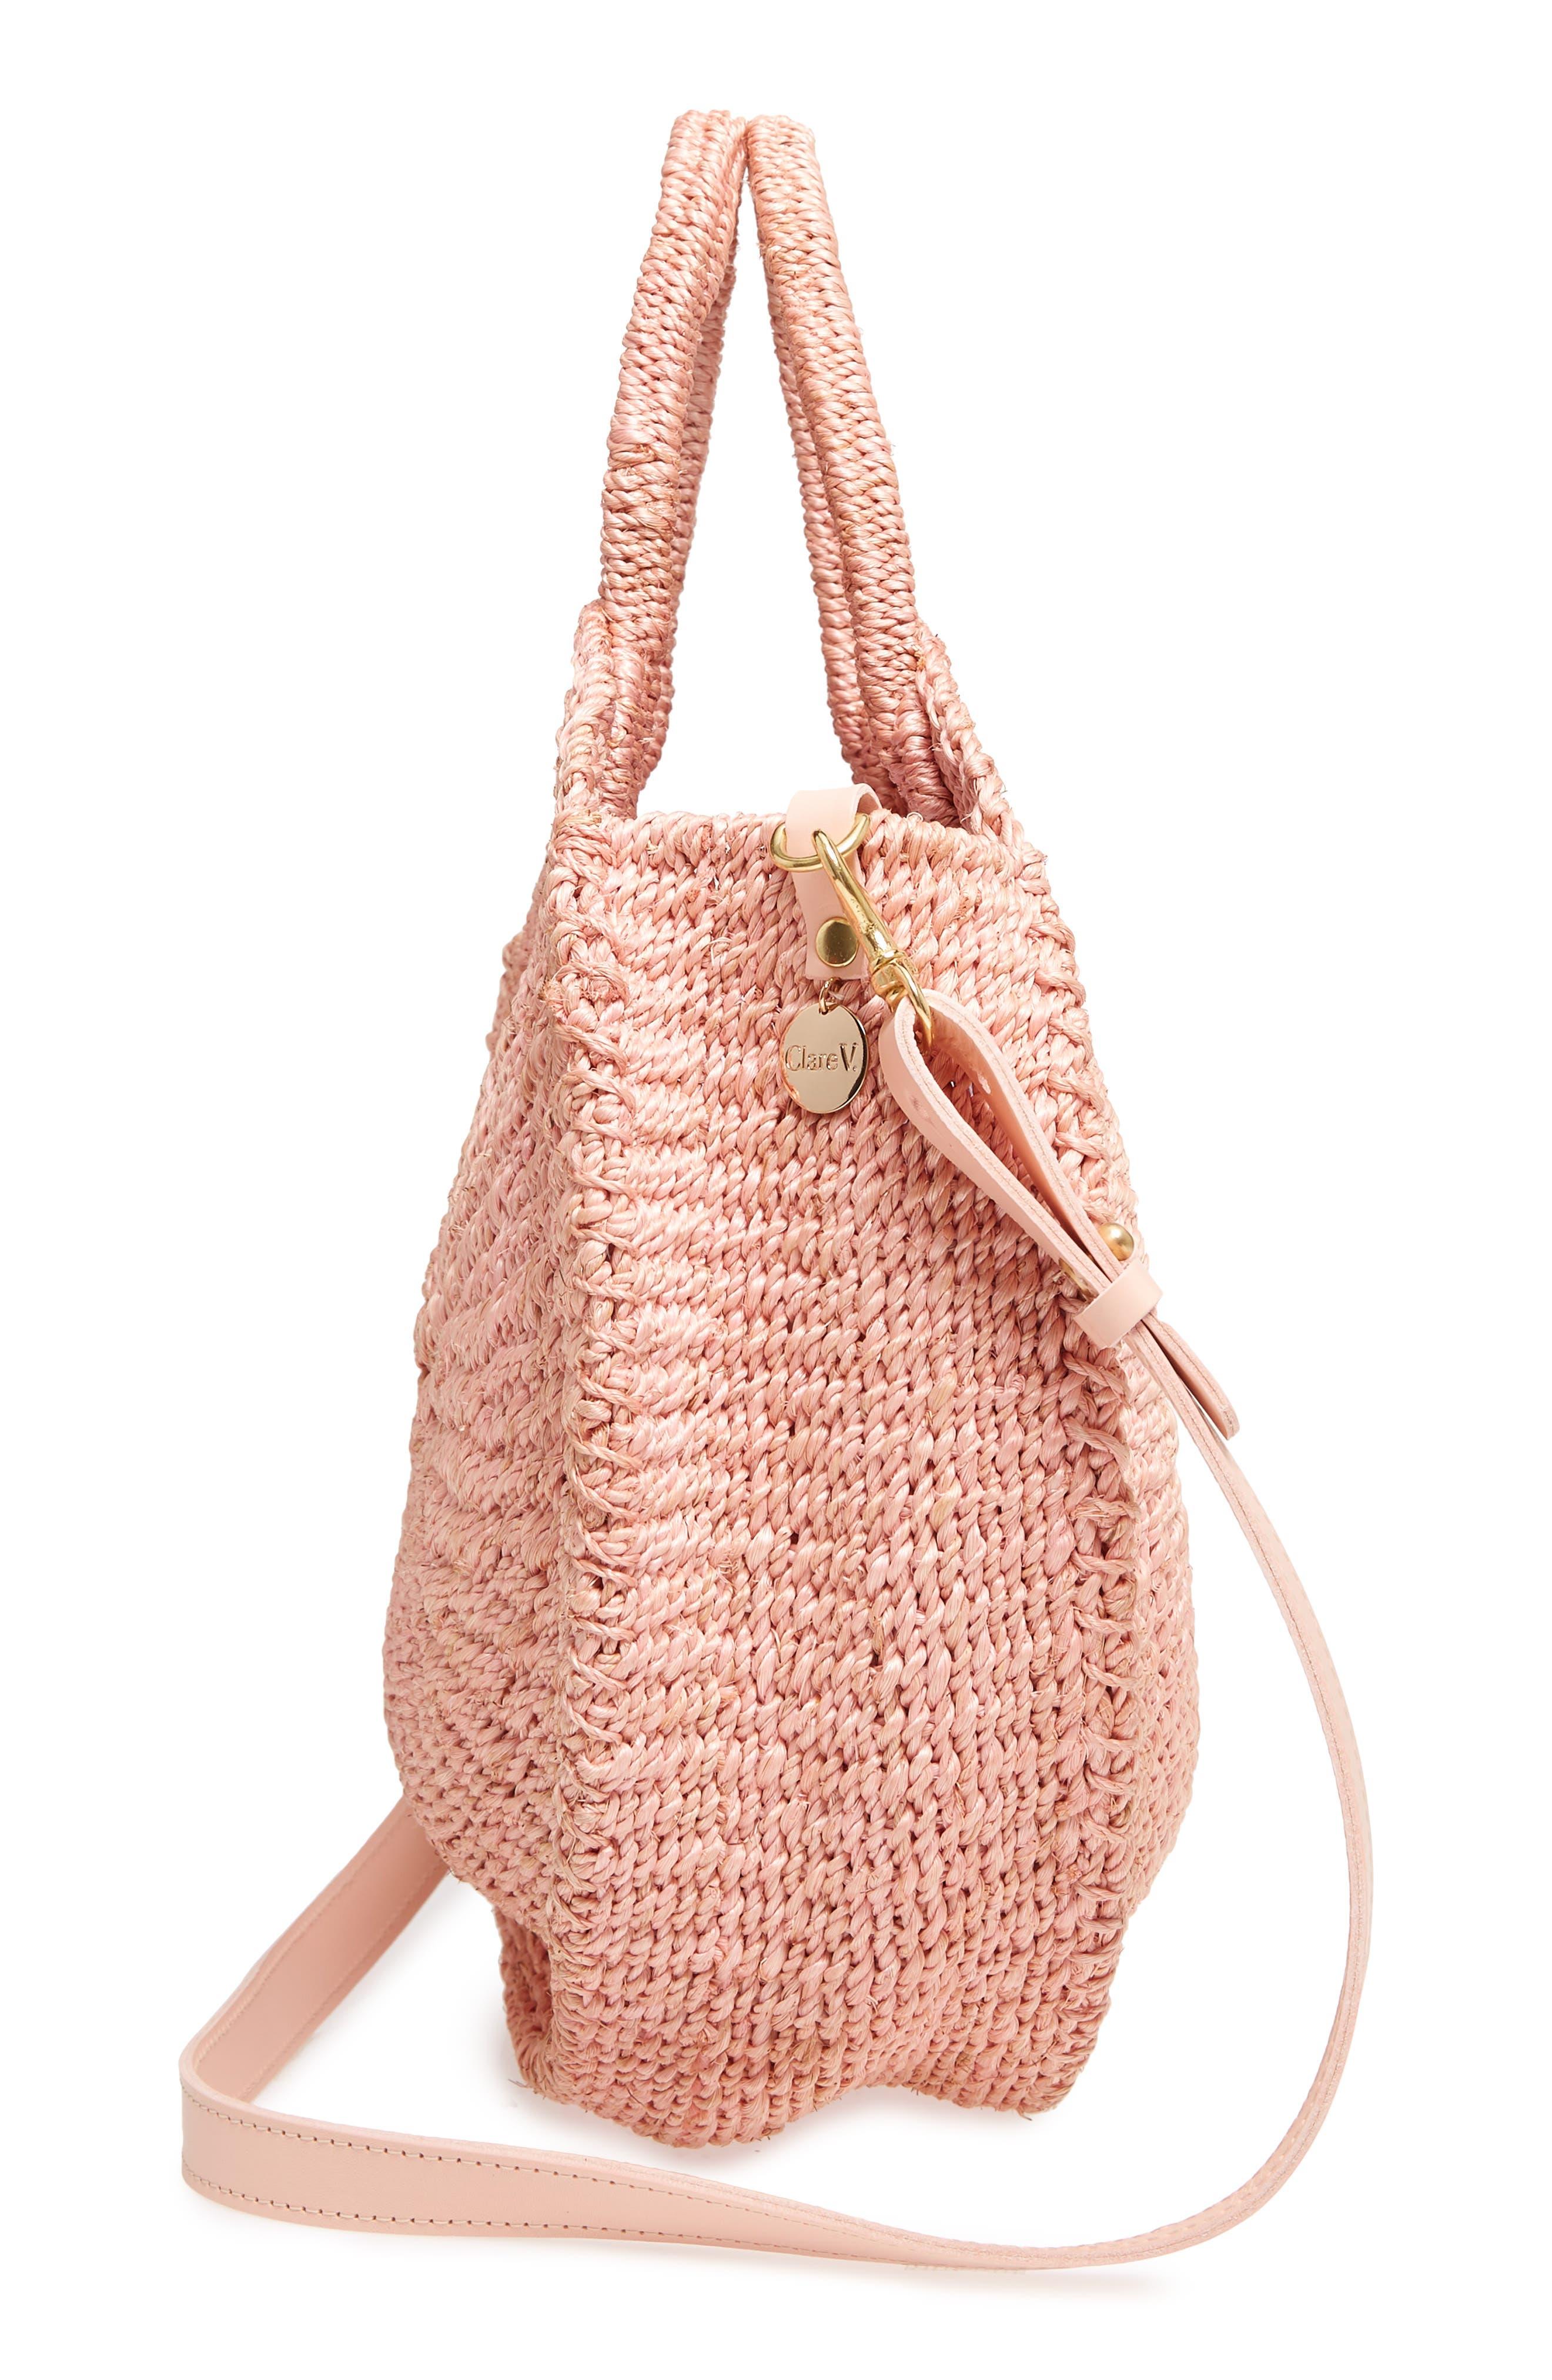 Alice Woven Sisal Straw Bag,                             Alternate thumbnail 5, color,                             Blush Woven